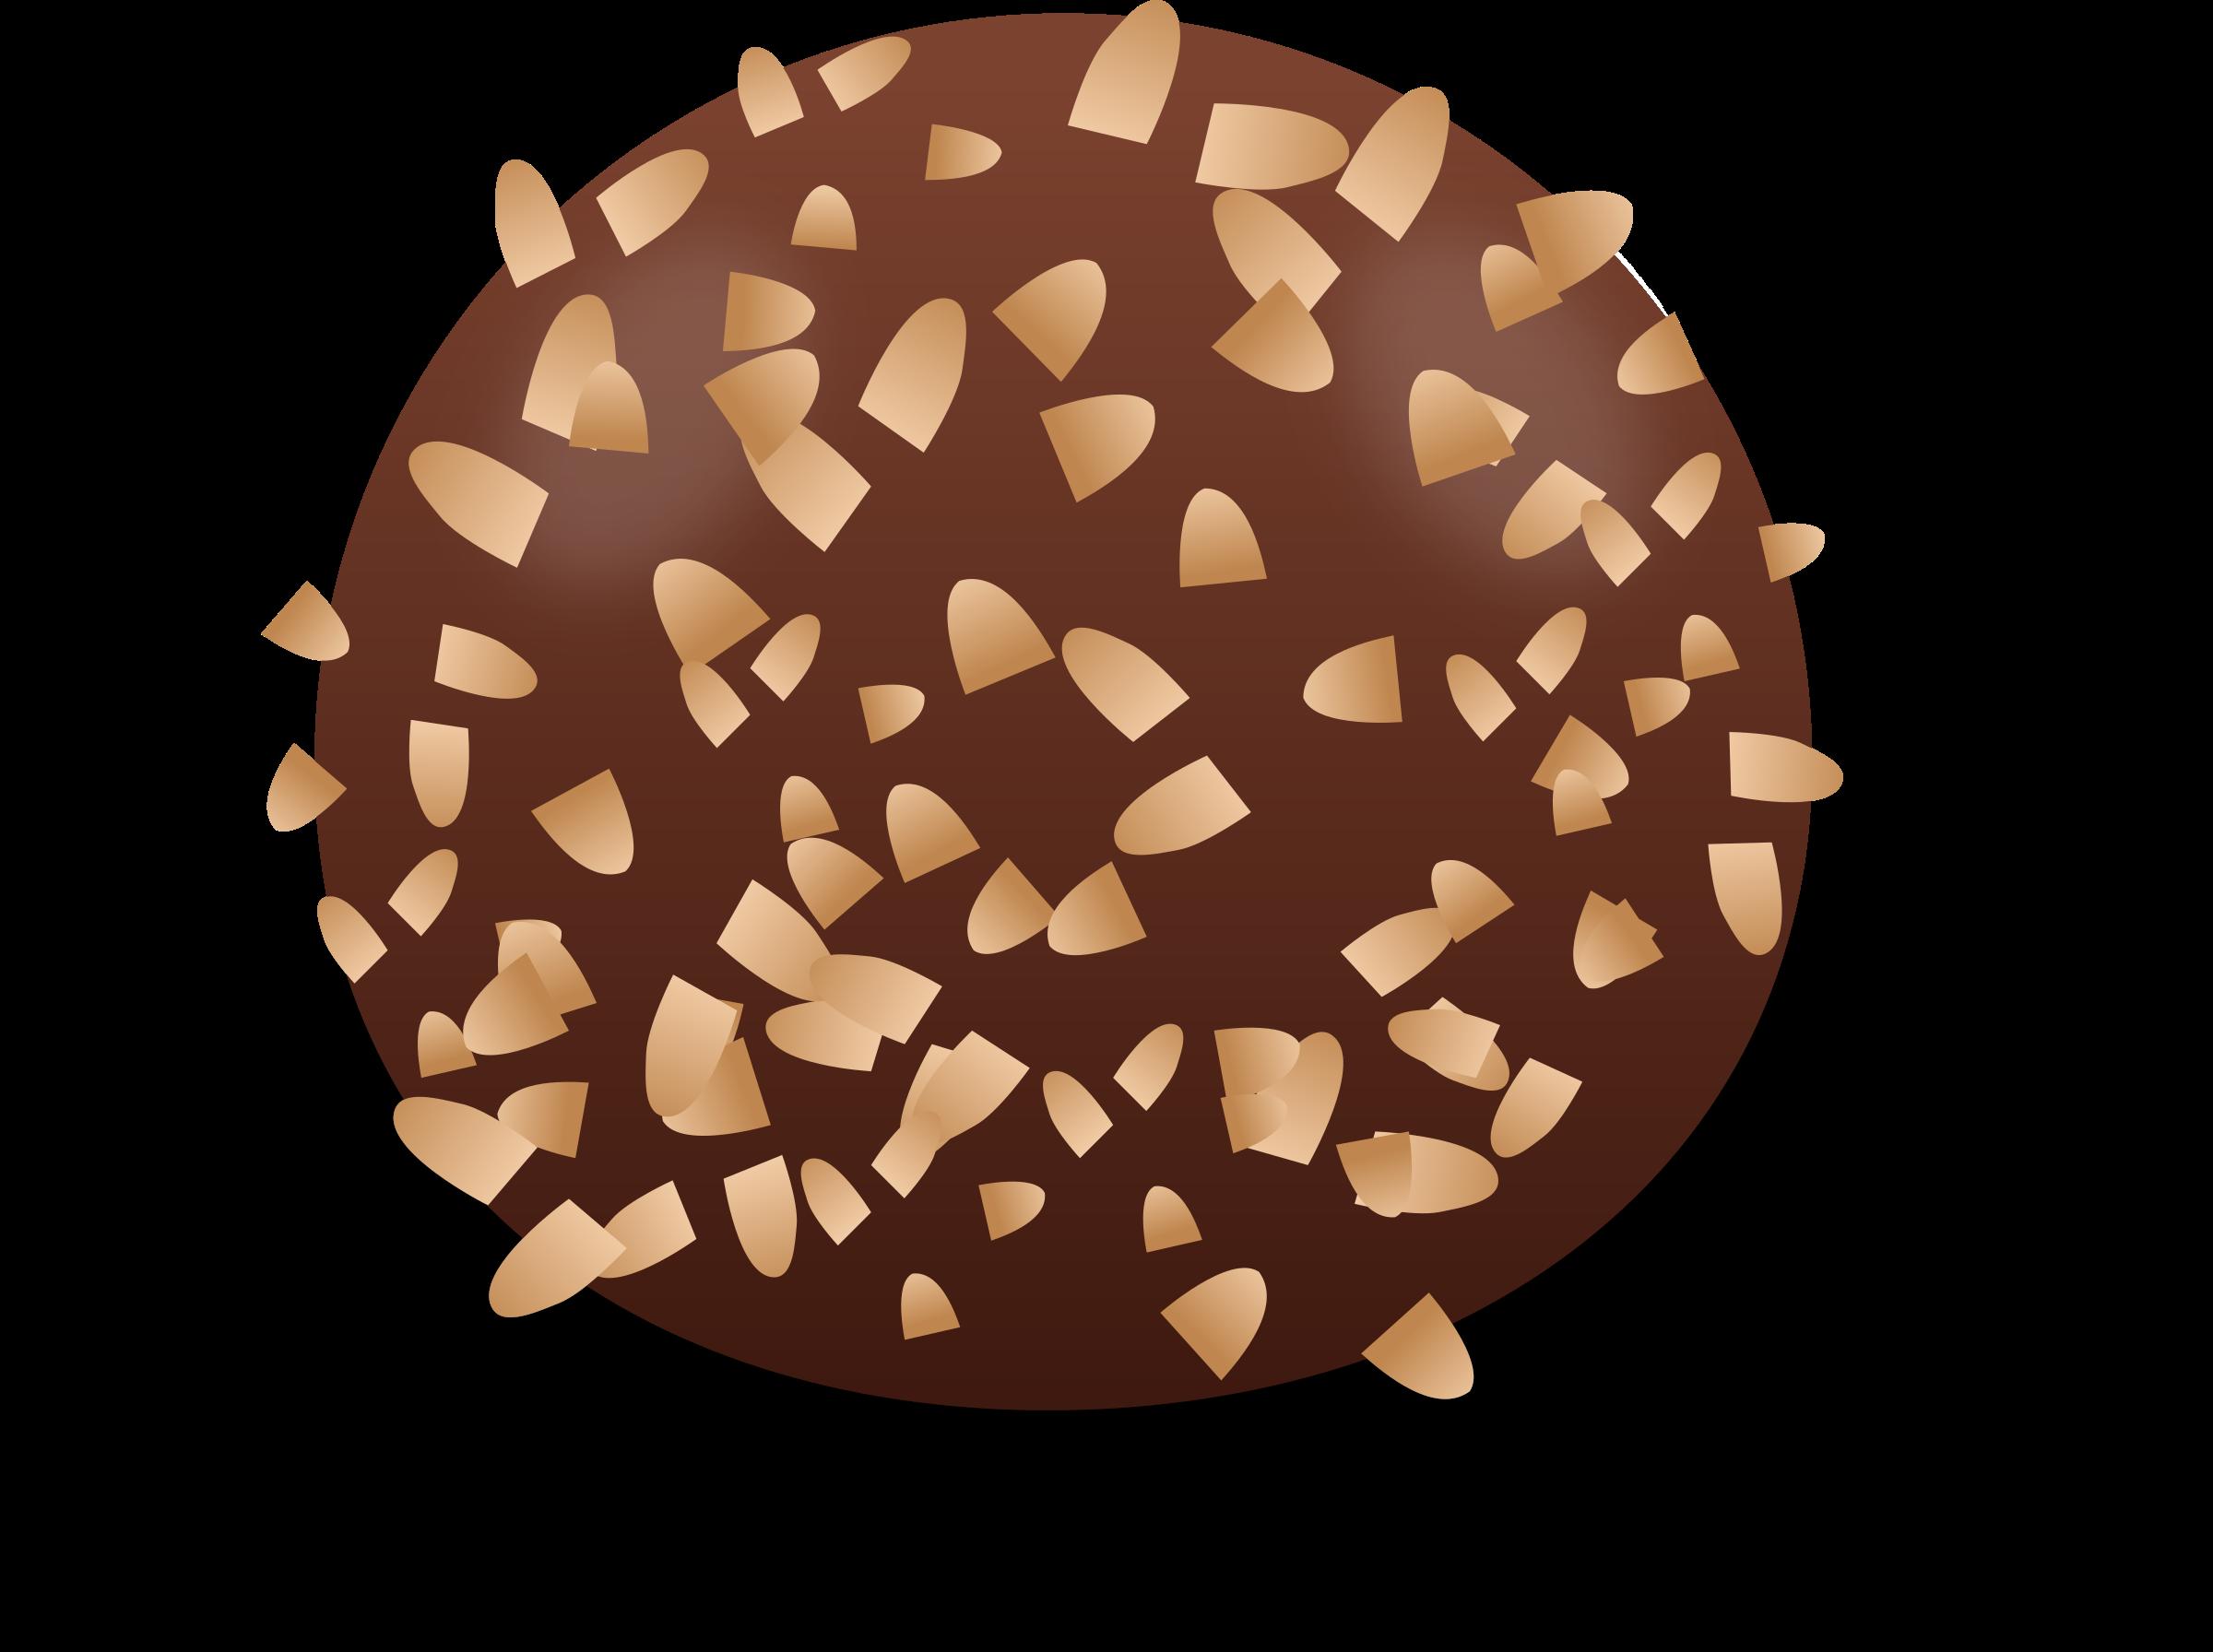 Nut clipart pecan nut. Praline big image png